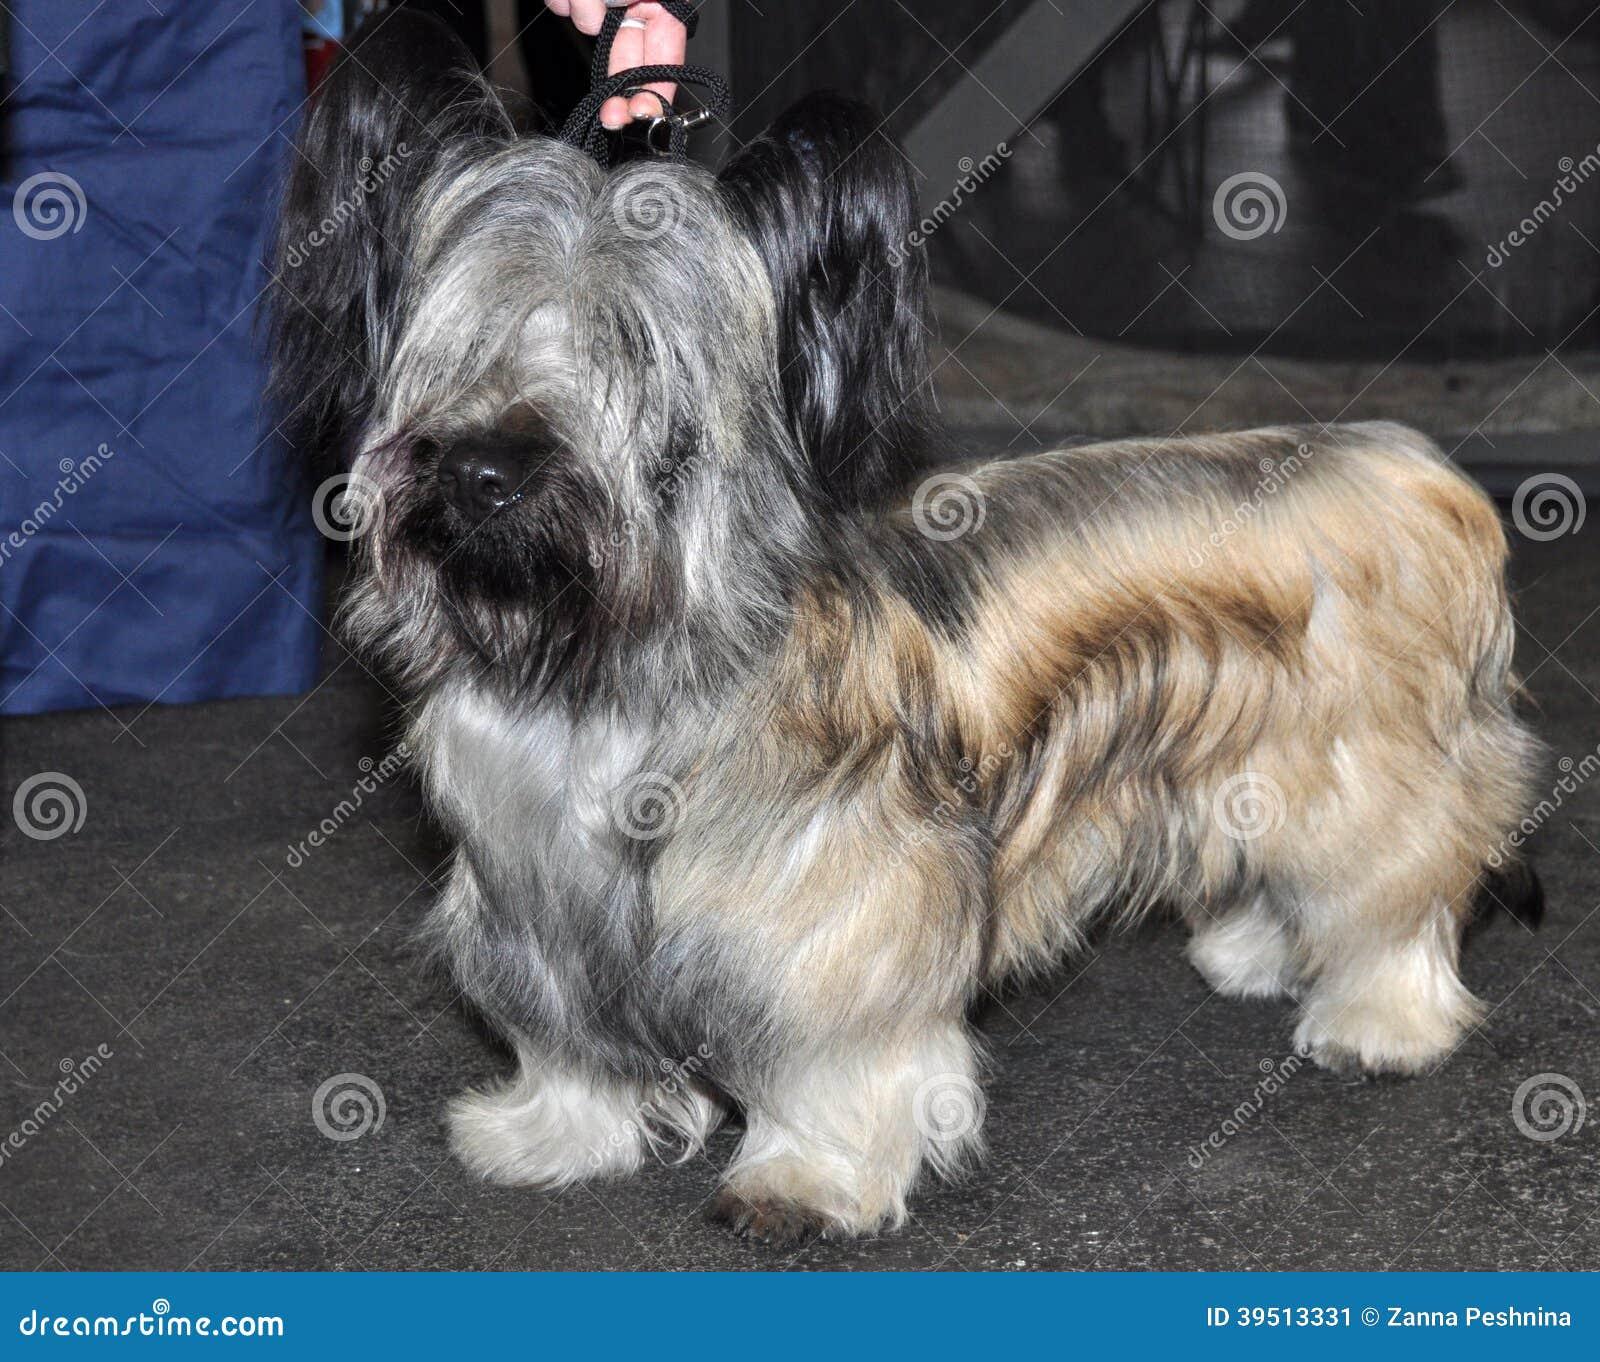 Skye Terrier dog exhibition